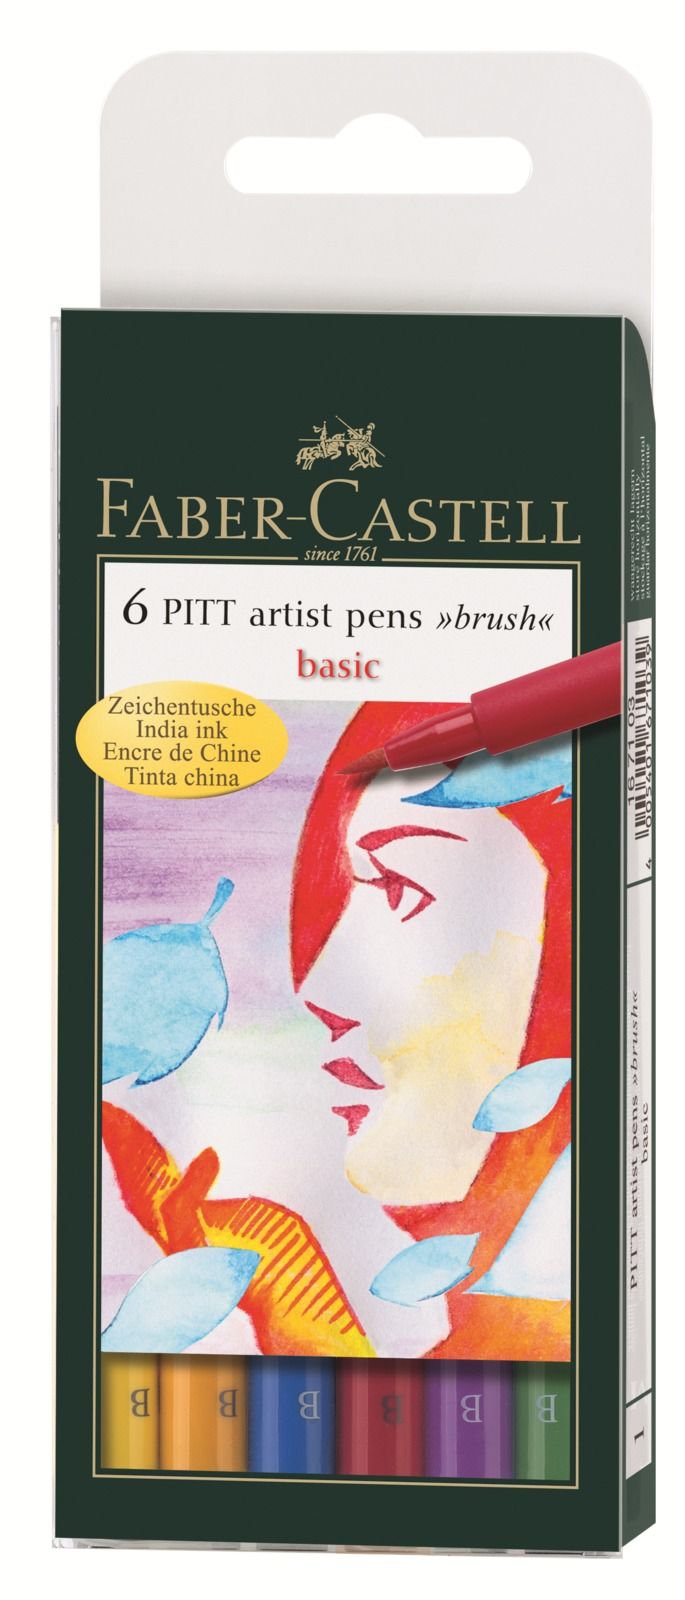 Faber-Castell: Pitt Artist Pens B Basics (Wallet of 6) image